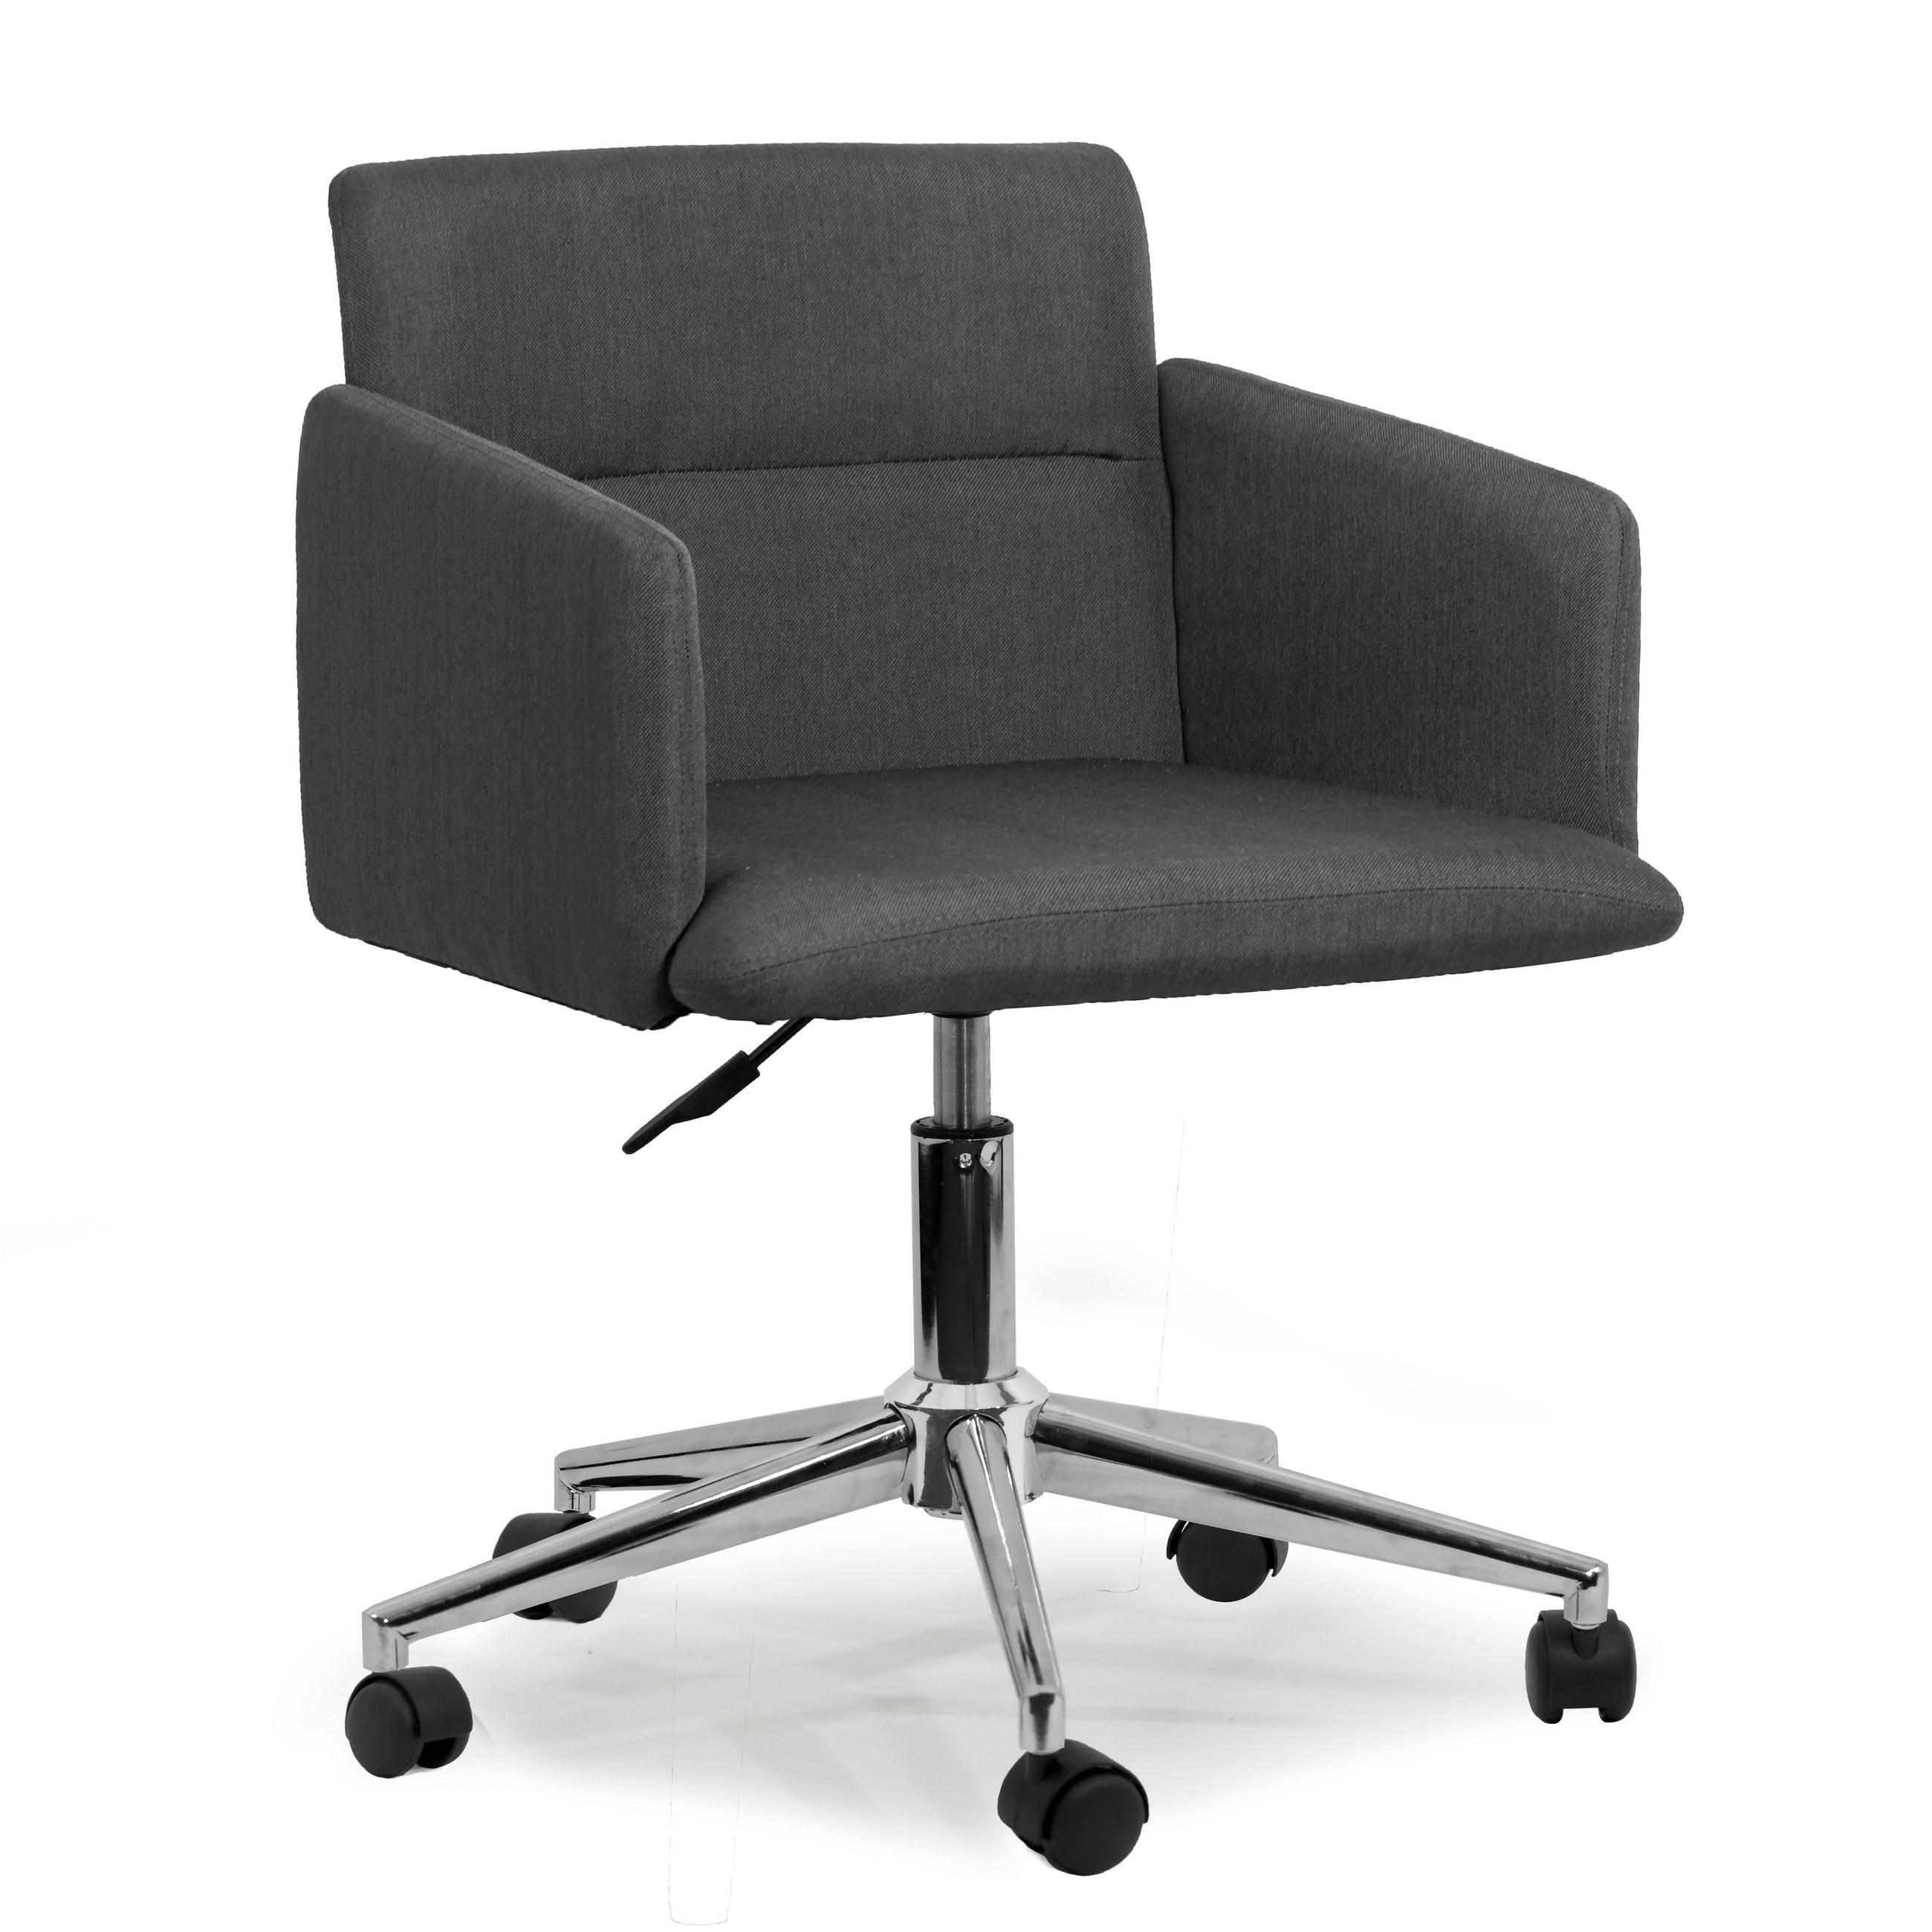 Chair With Wheels >> Aila Dark Grey Fabric Swivel Office Chair With Wheel Base